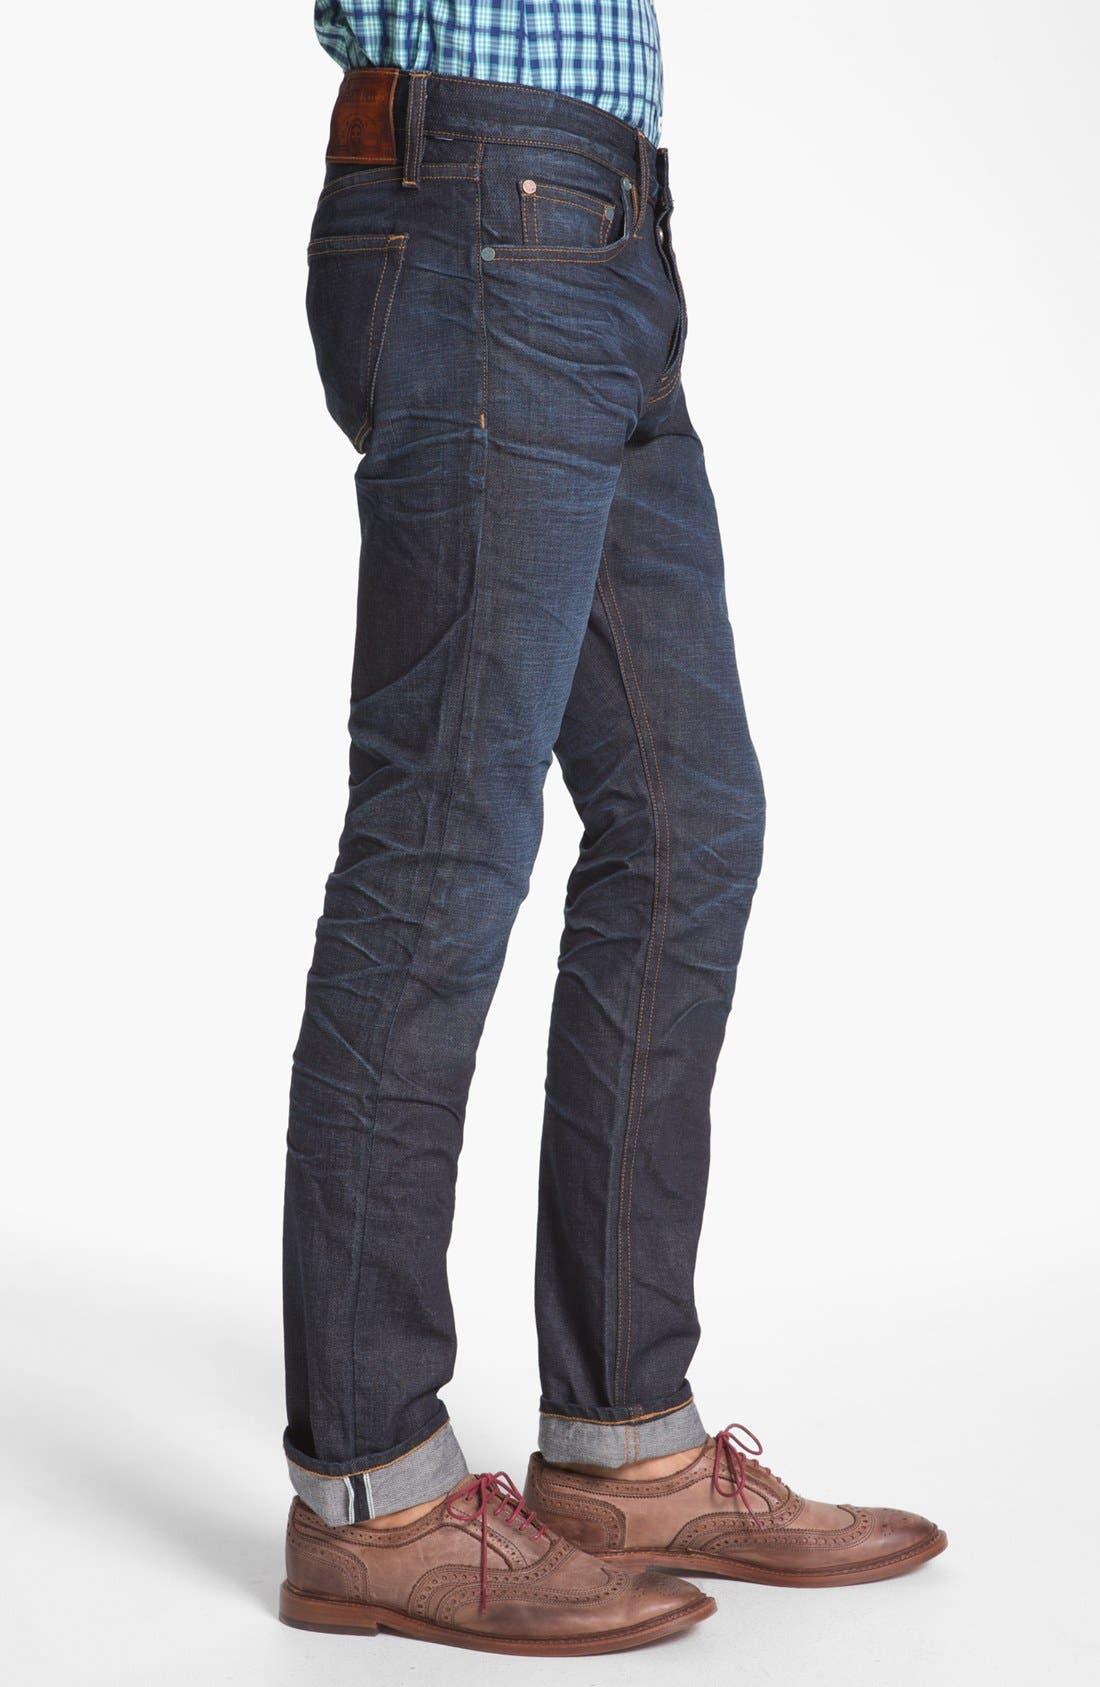 Alternate Image 3  - Asbury Park '1888 Skinny Fit' Raw Selvedge Jeans